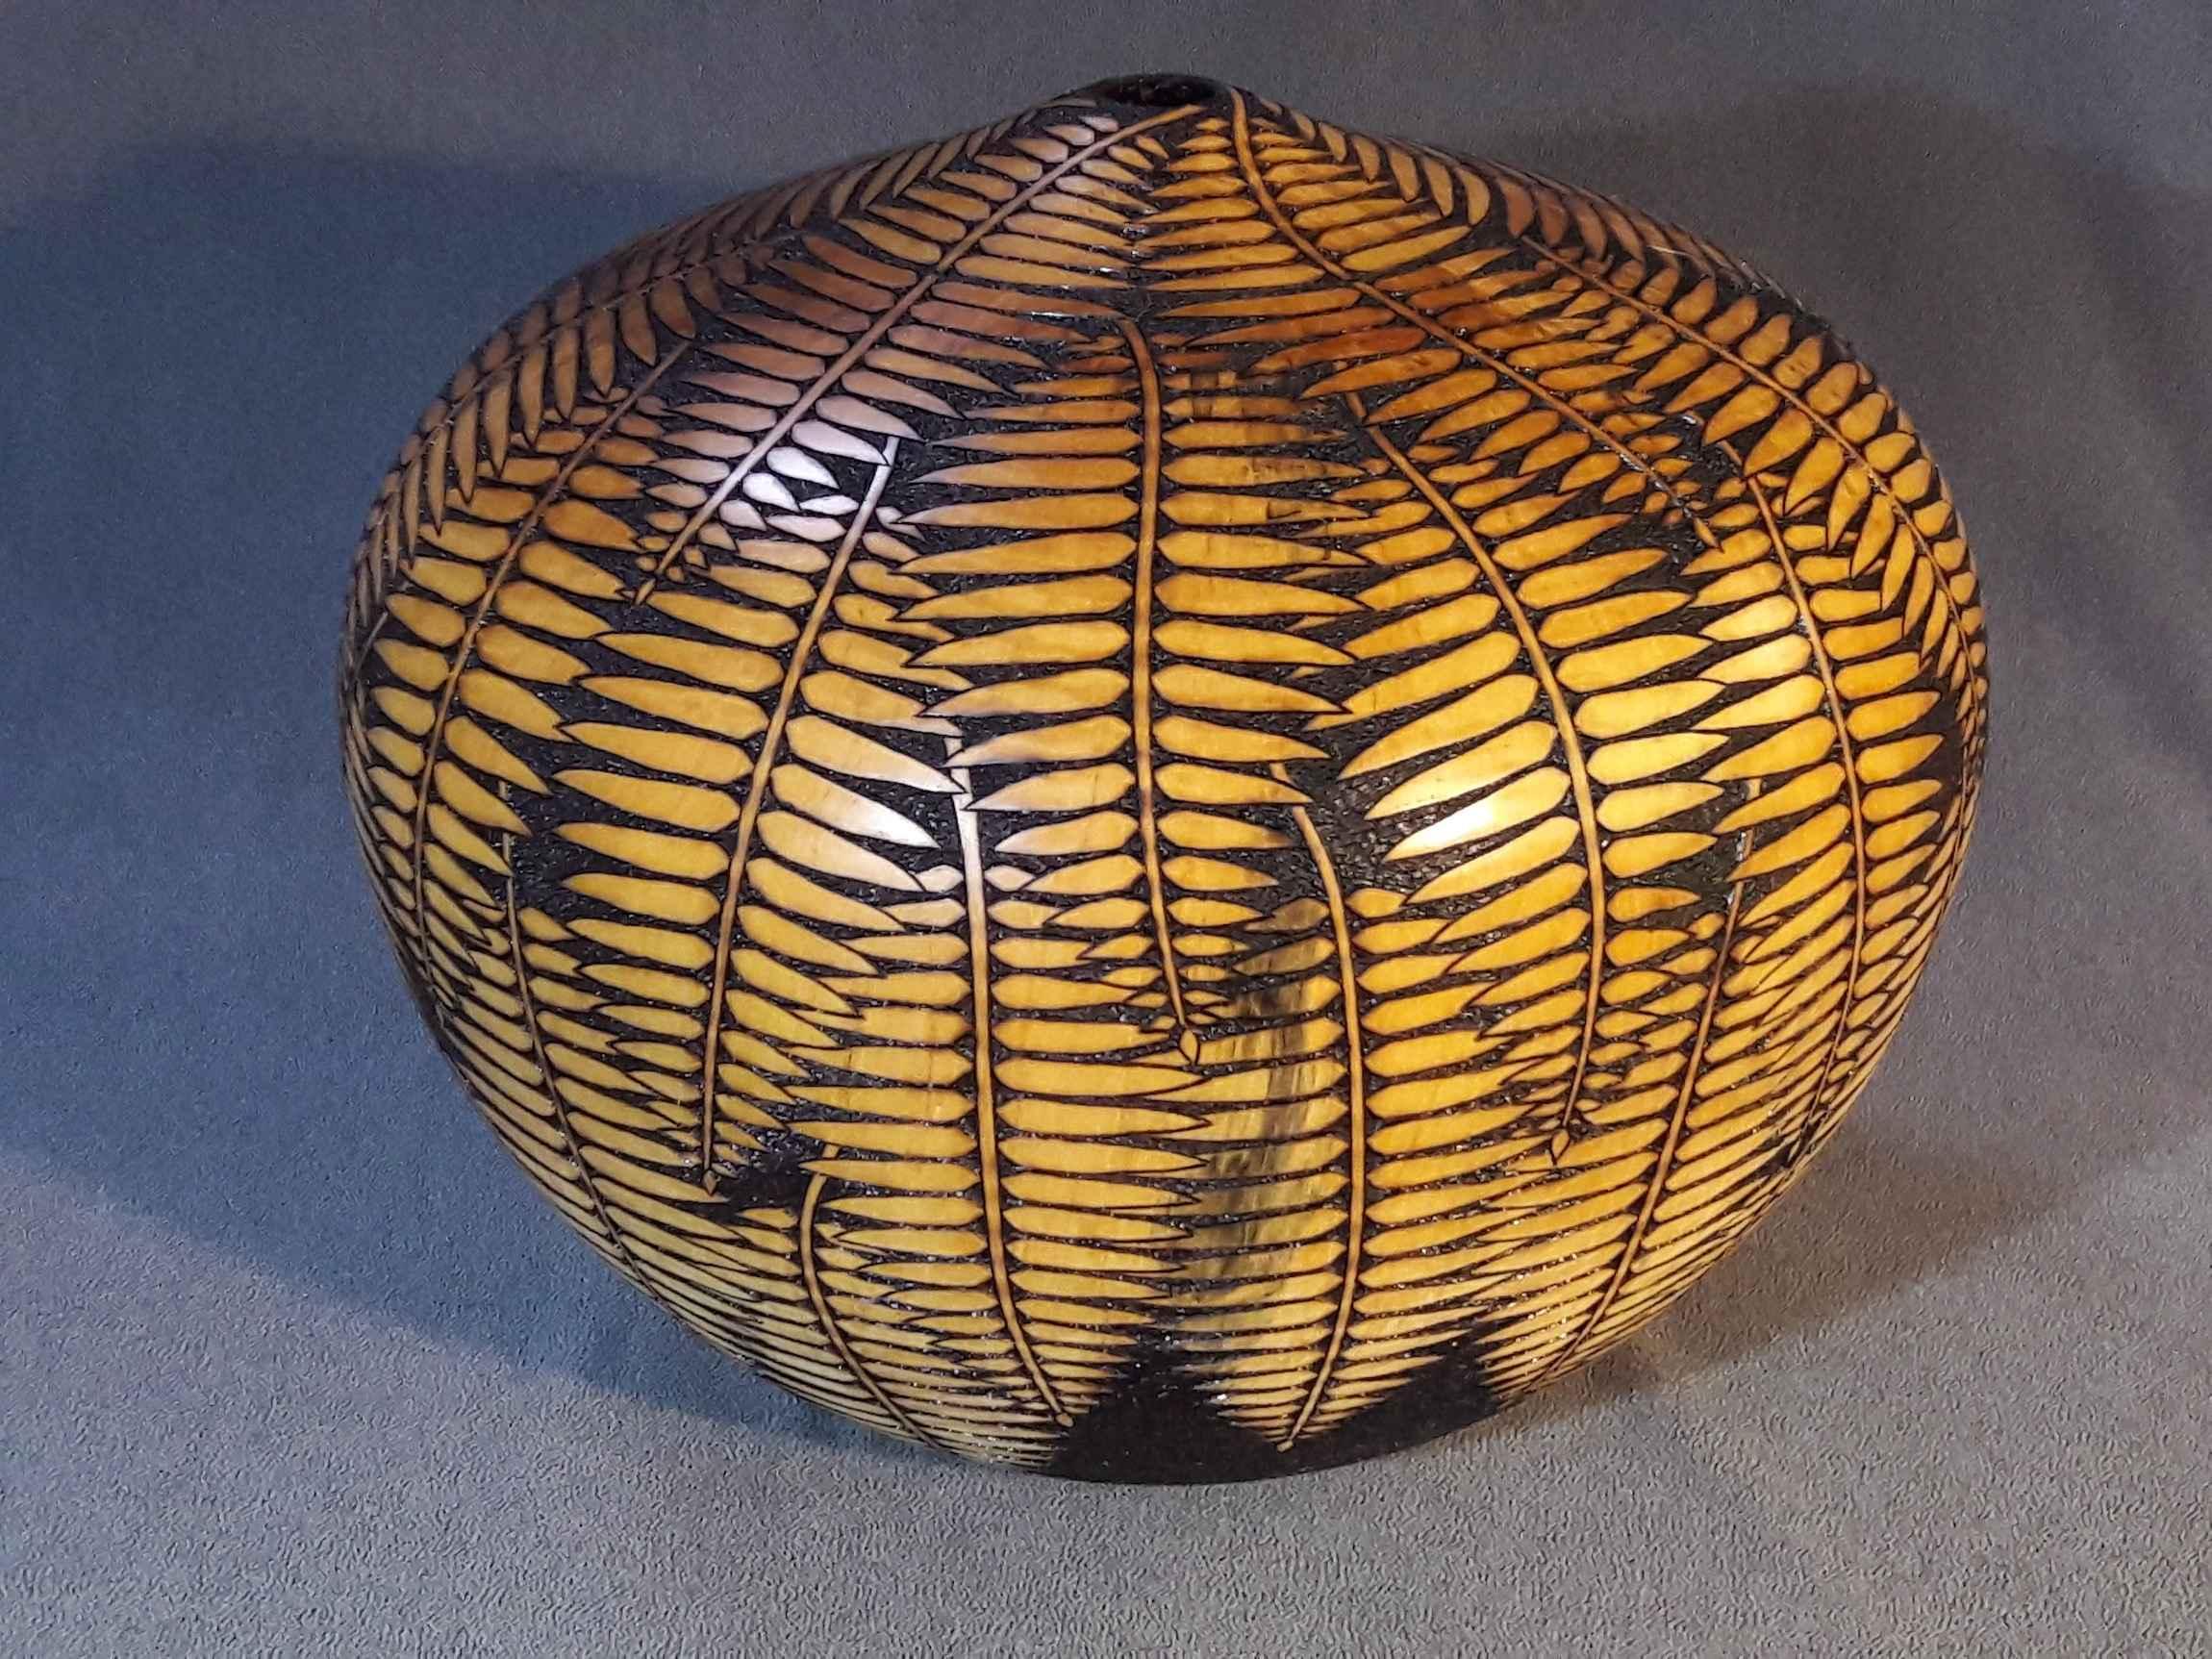 Fern Vessel by Mr. Michael Patrick Smith - Masterpiece Online